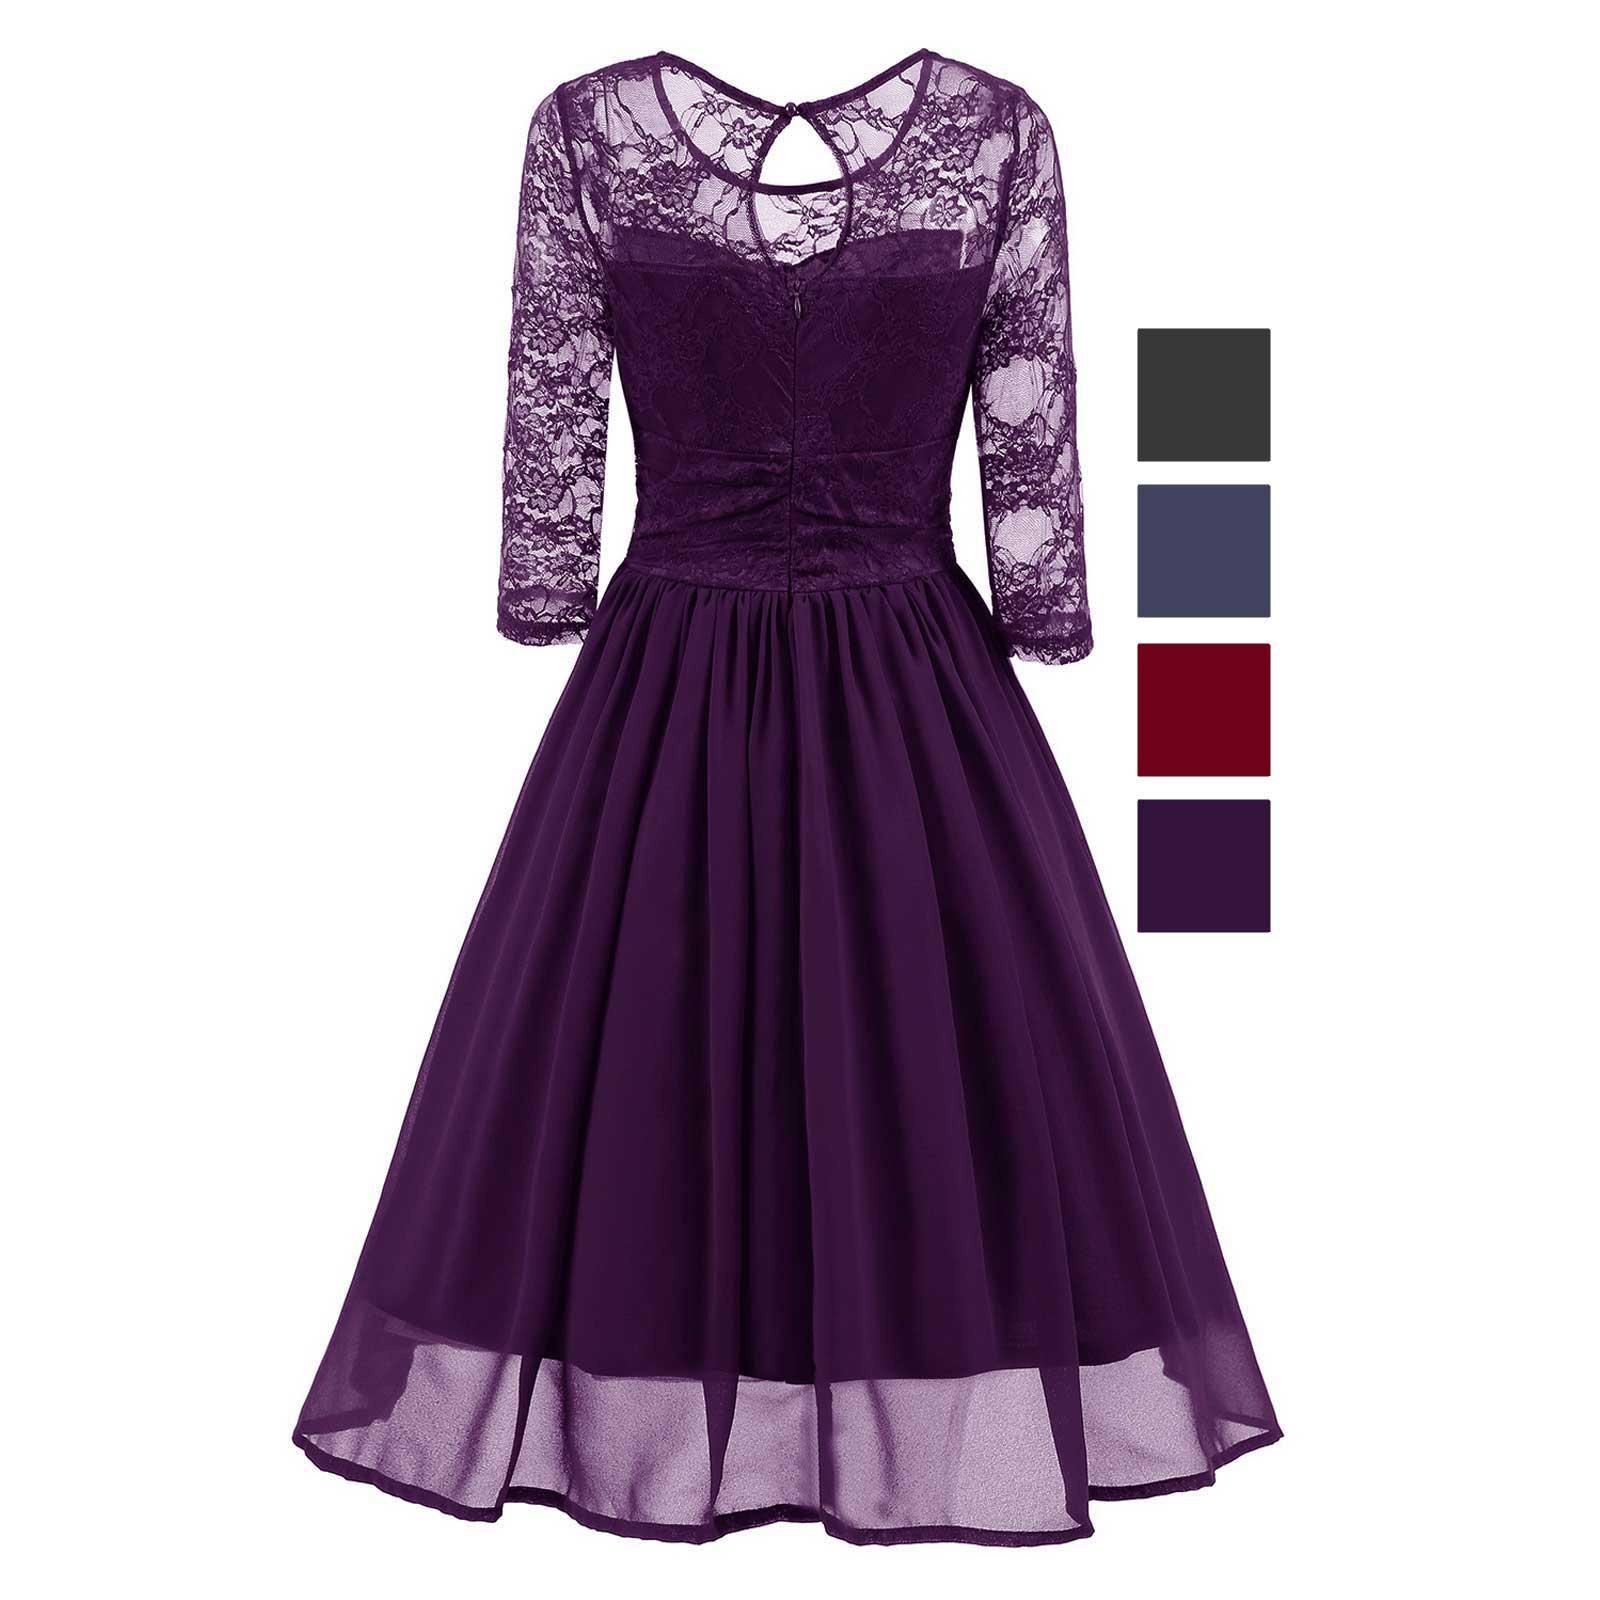 Classic Retro Chiffon Fit And Flare Wedding Evening Bridesmaid A Line Dress